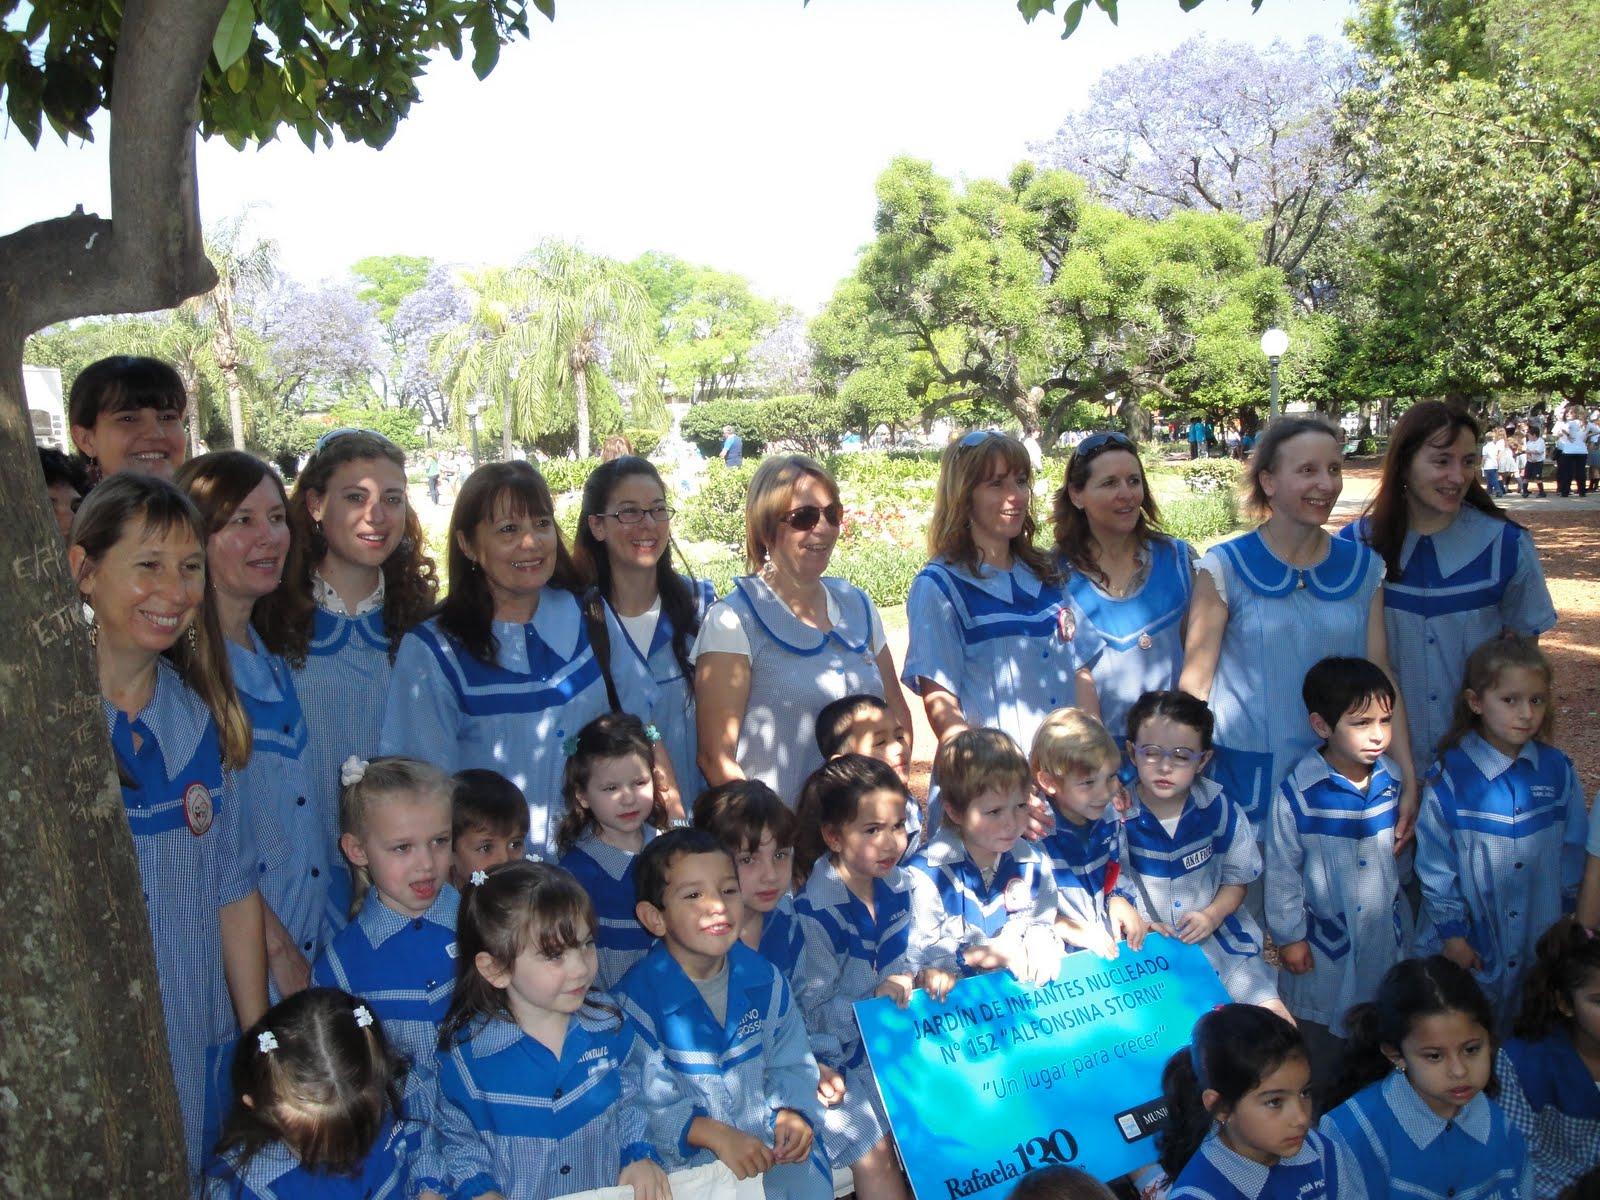 Jard n de infantes nucleado n 152 alfonsina storni for Azul naranja jardin de infantes